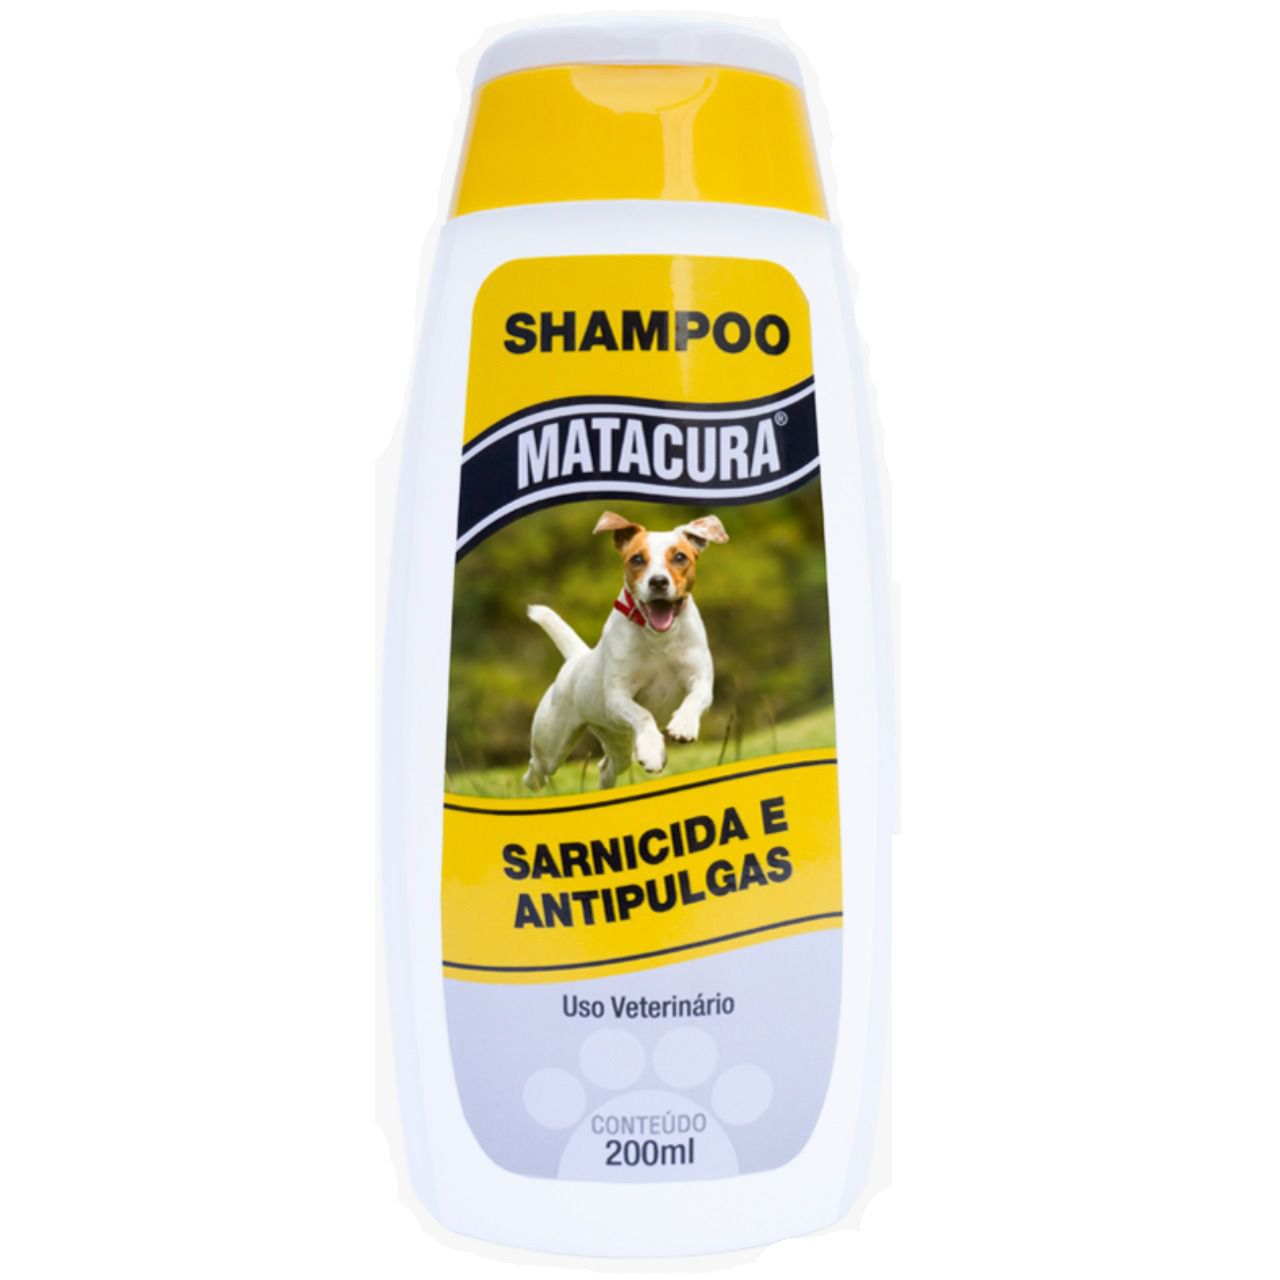 Shampoo Matacura 200ml